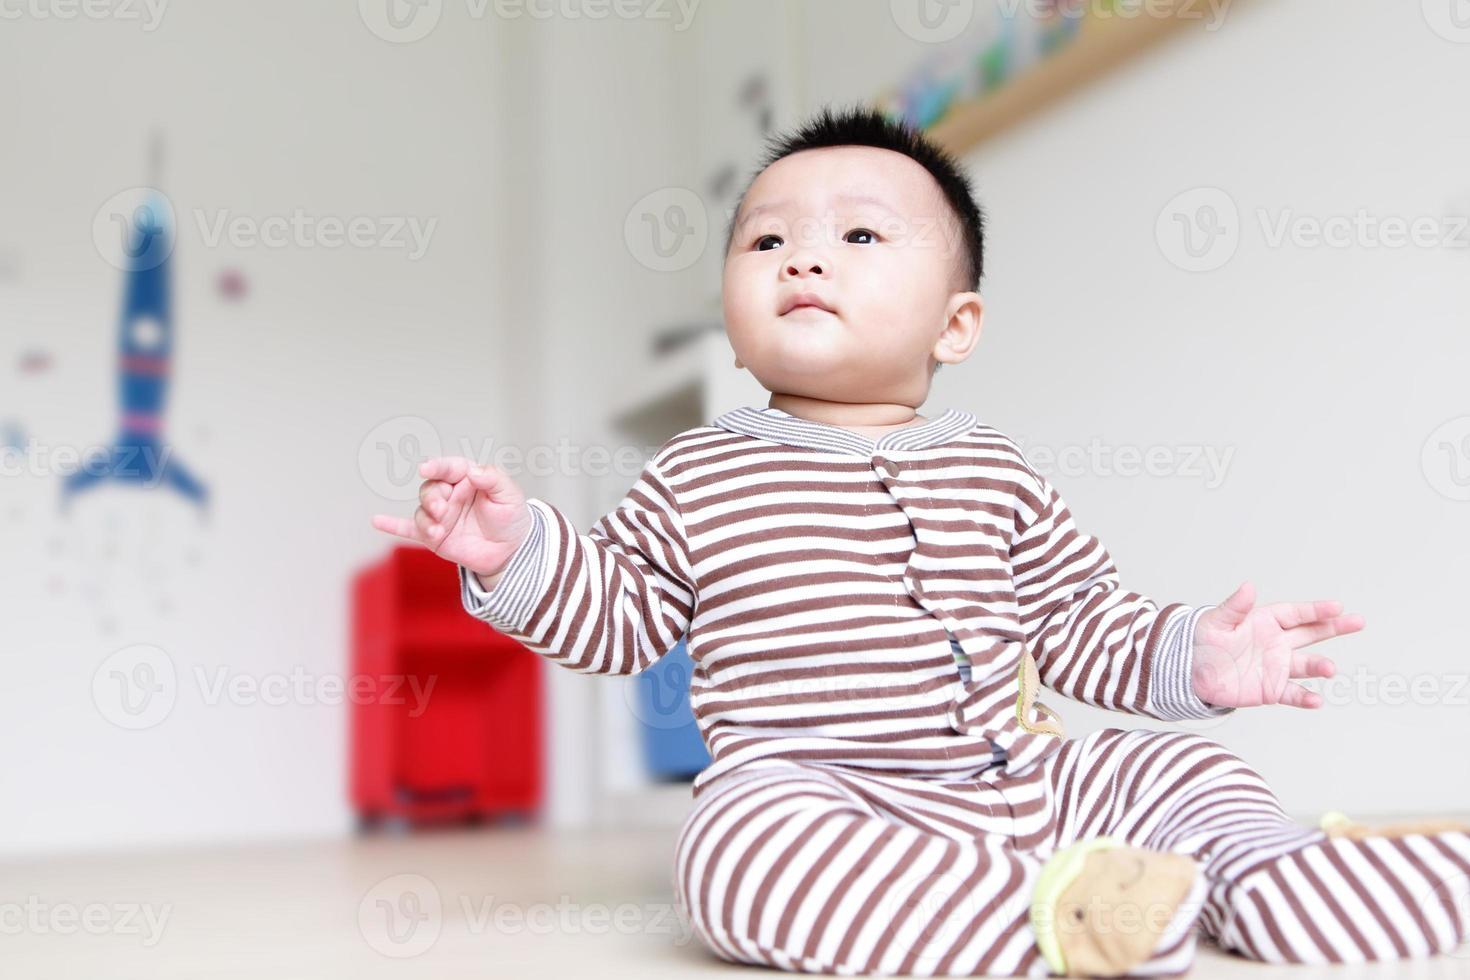 bel bambino guarda in avanti foto